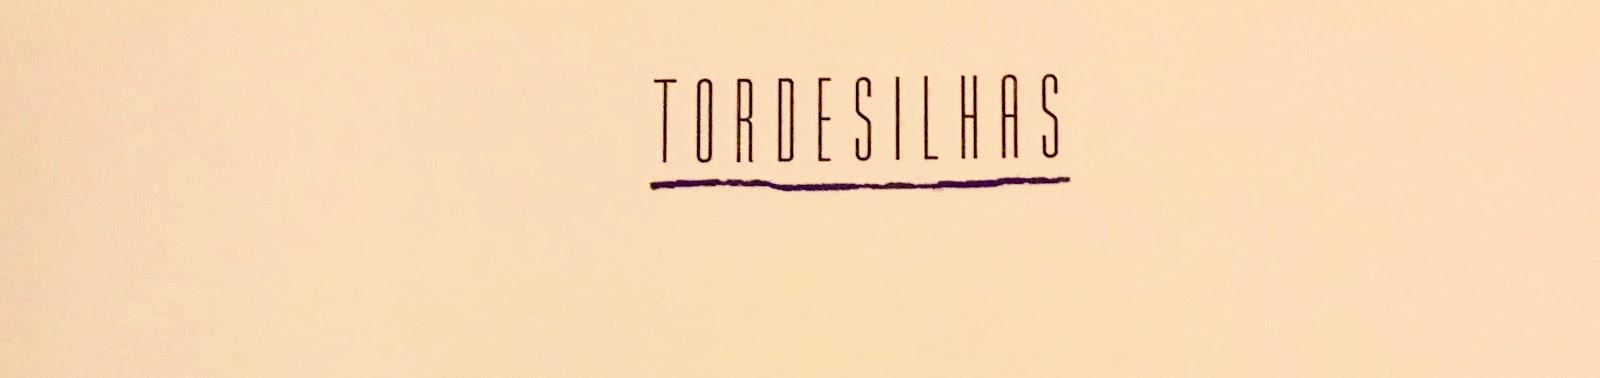 ristorante tordesilhas cucina brASILIANA ALESSANDRA RUGGERI